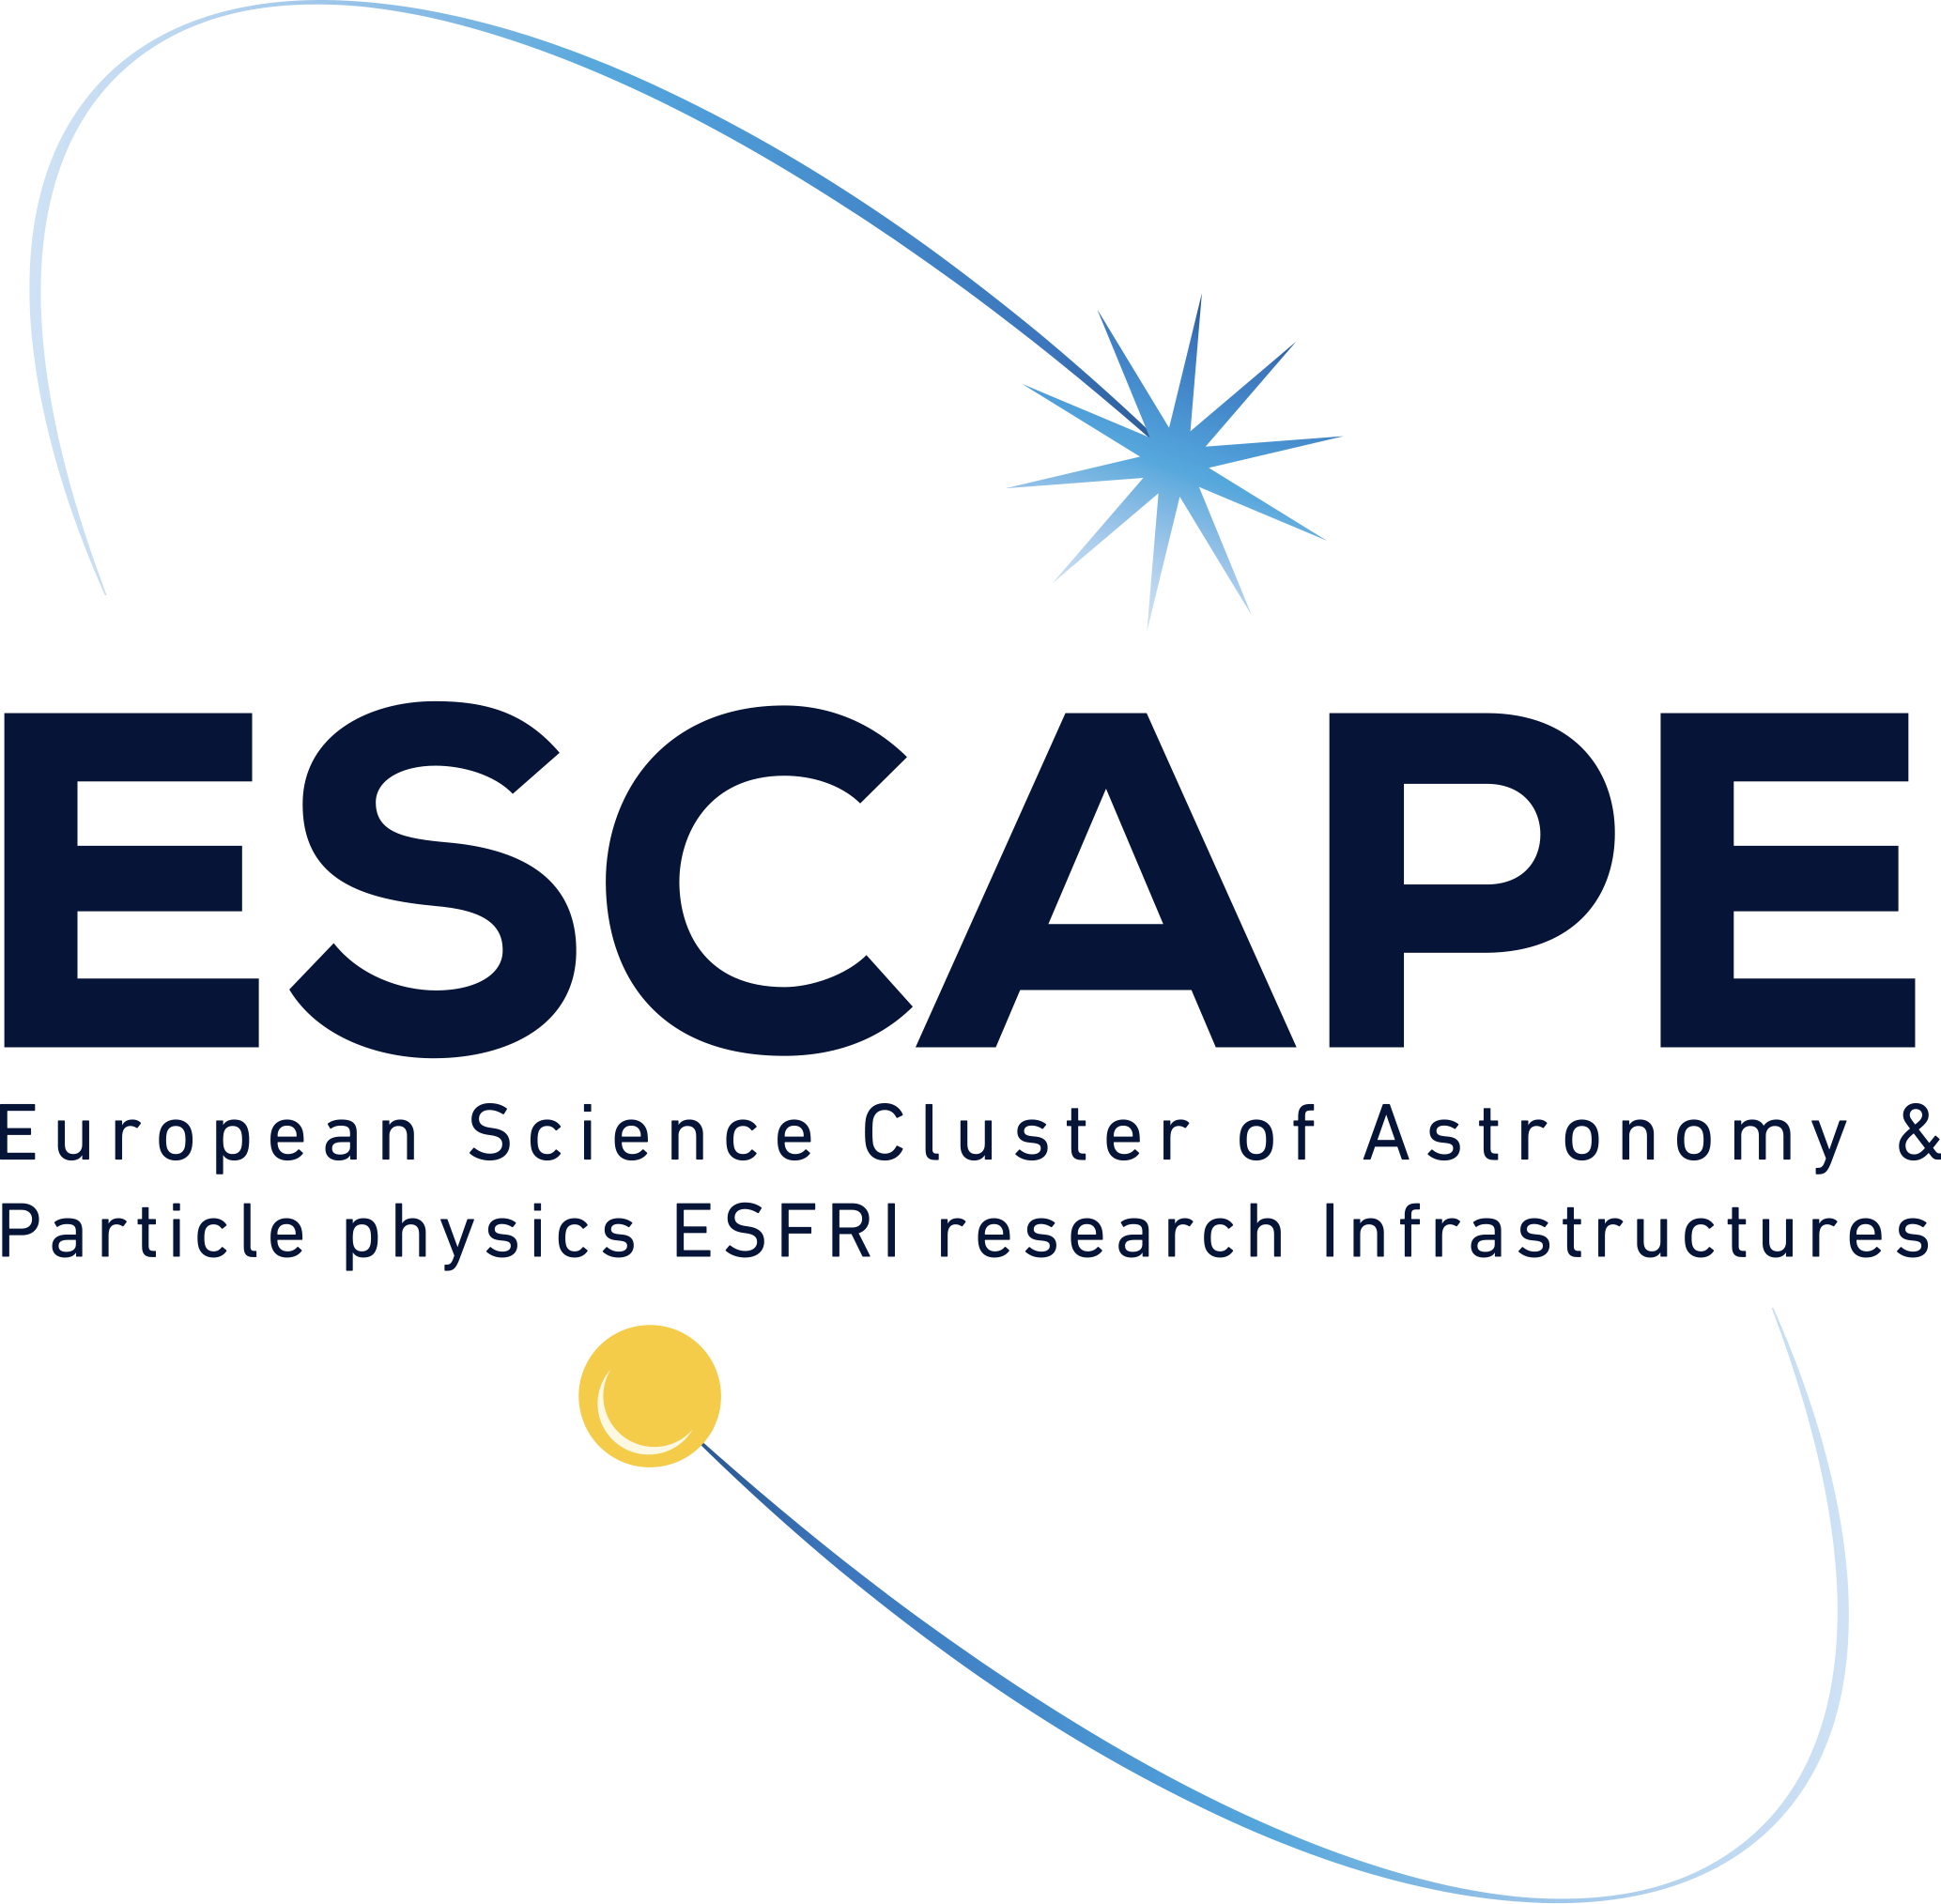 03-Escape-logo.jpg.png